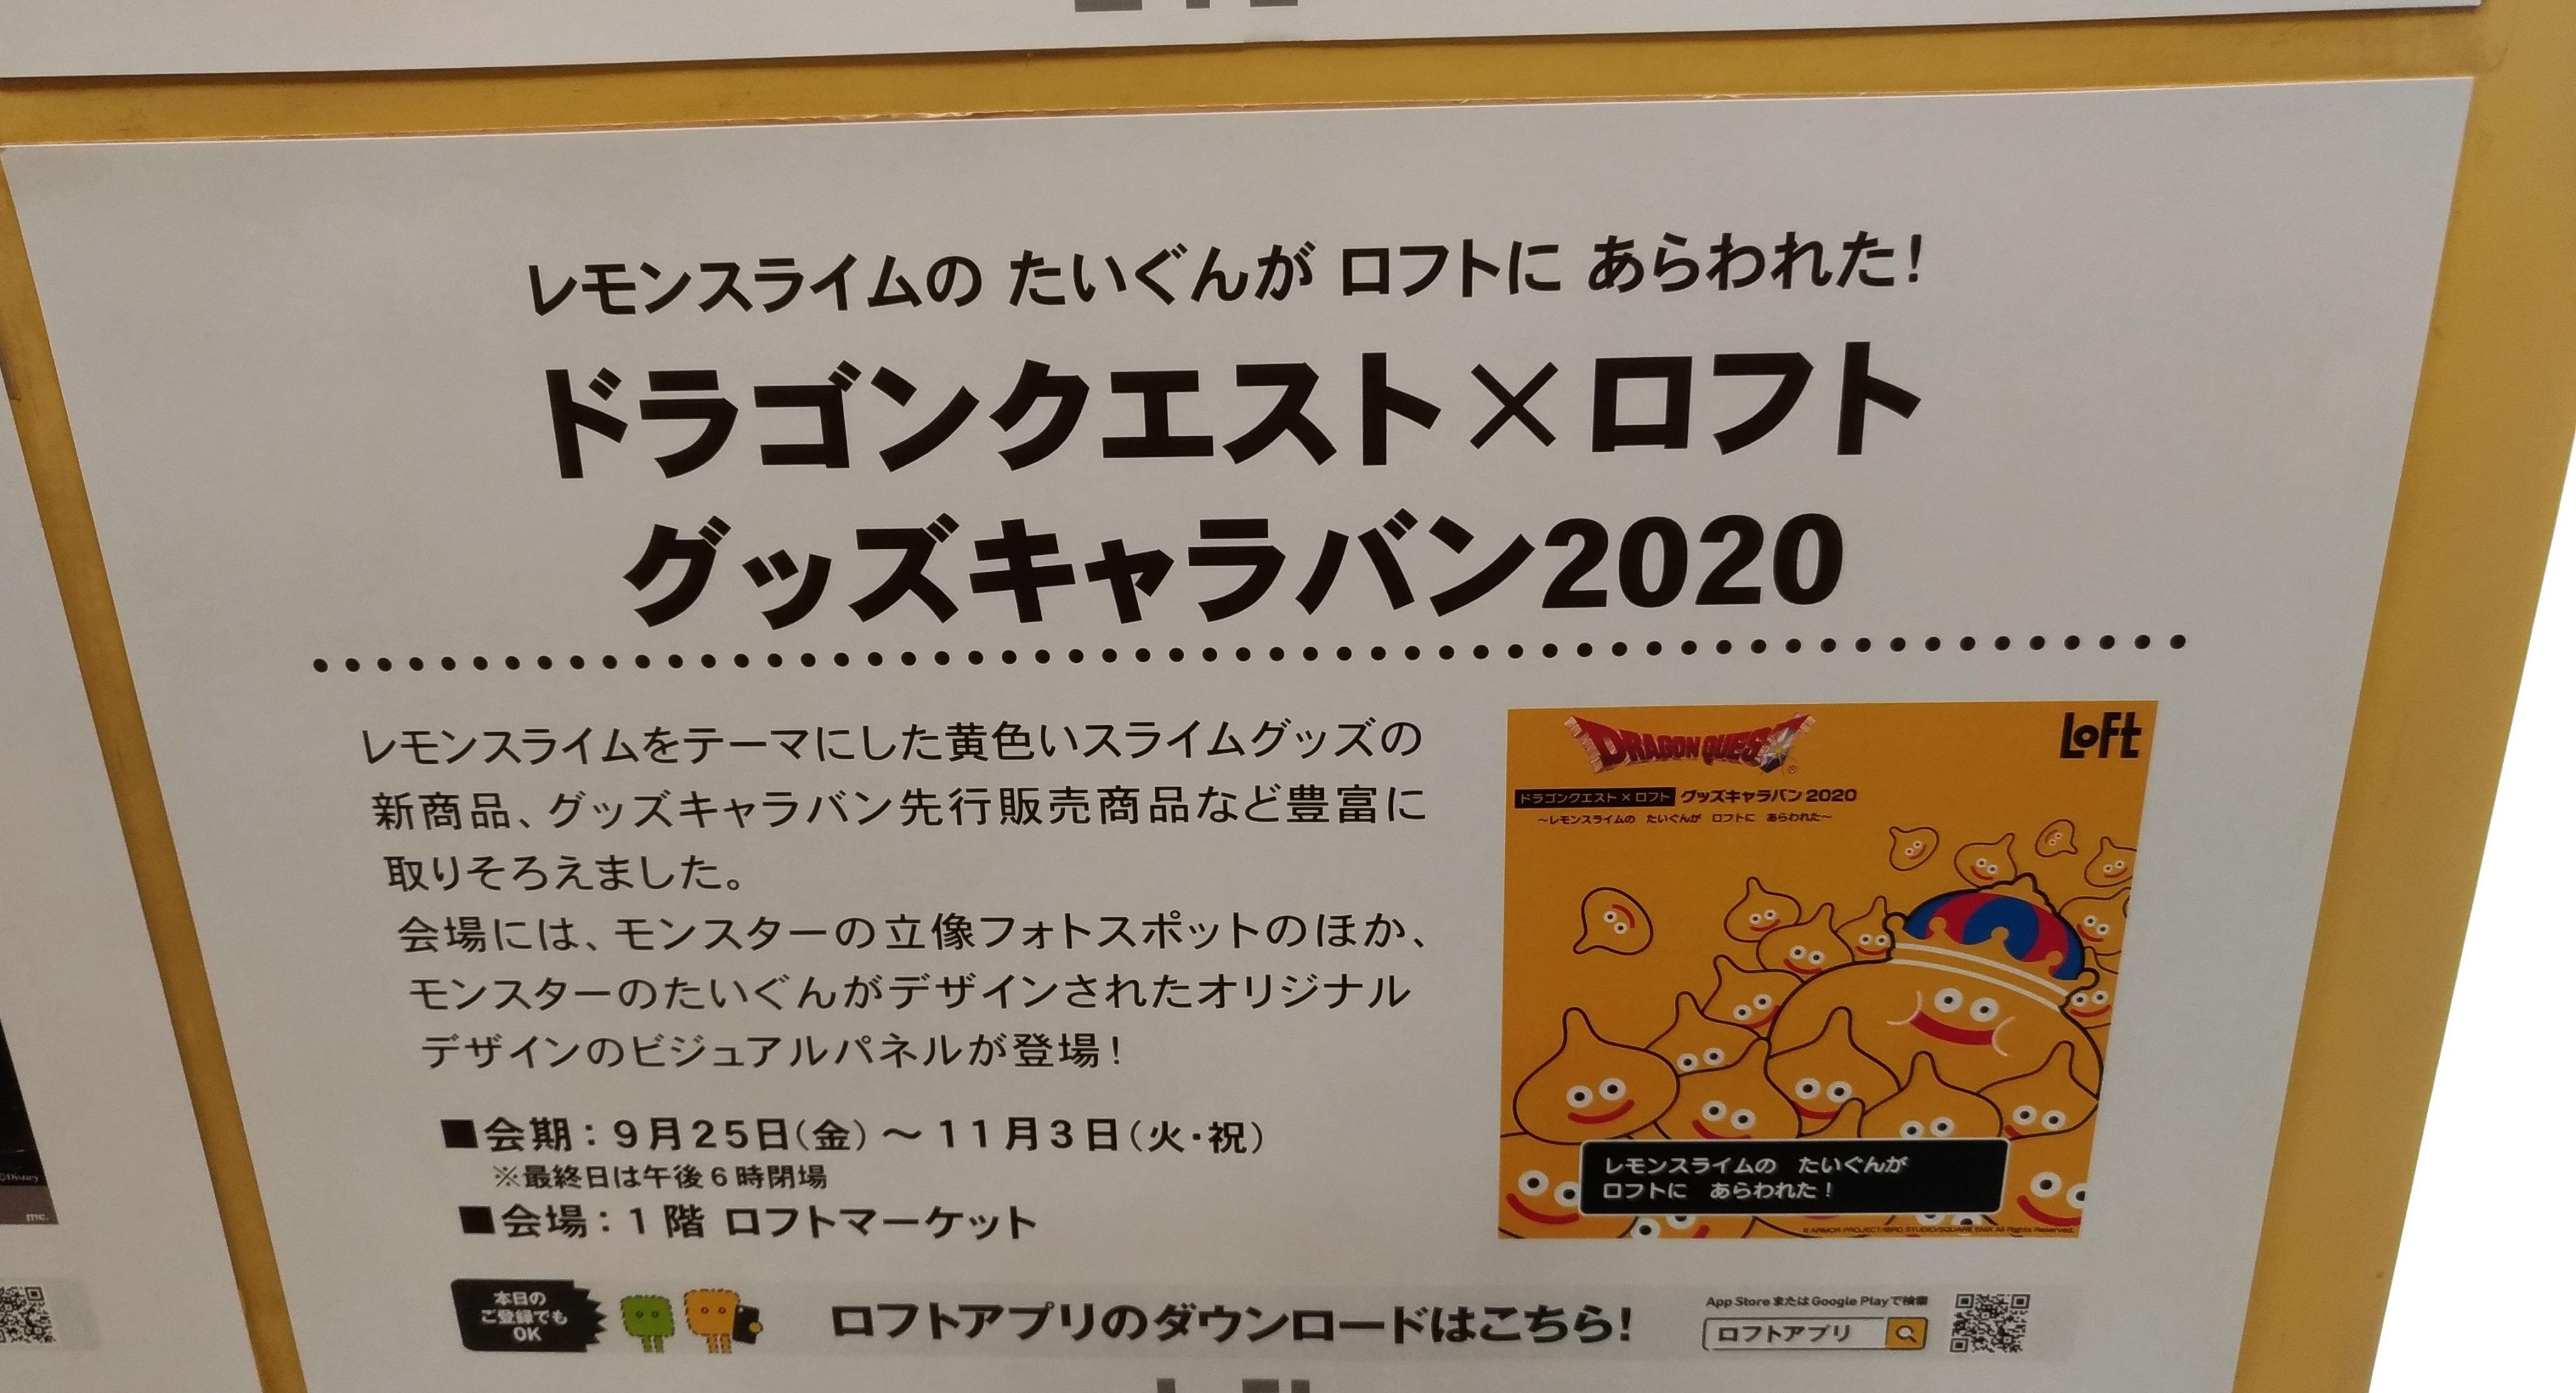 dragonquest2020_loft_umeda_osaka_3.jpg